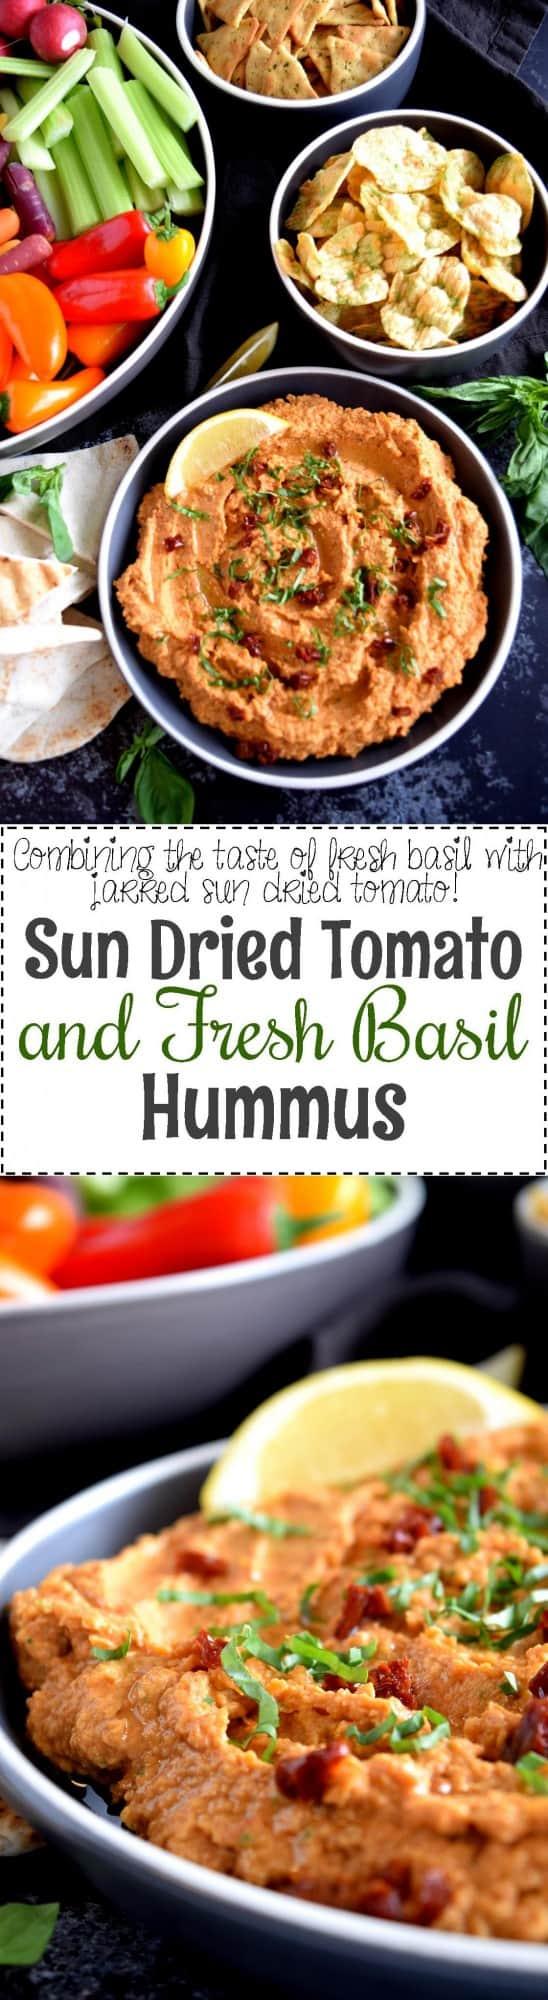 Sun Dried Tomato and Fresh Basil Hummus - Lord Byron's Kitchen